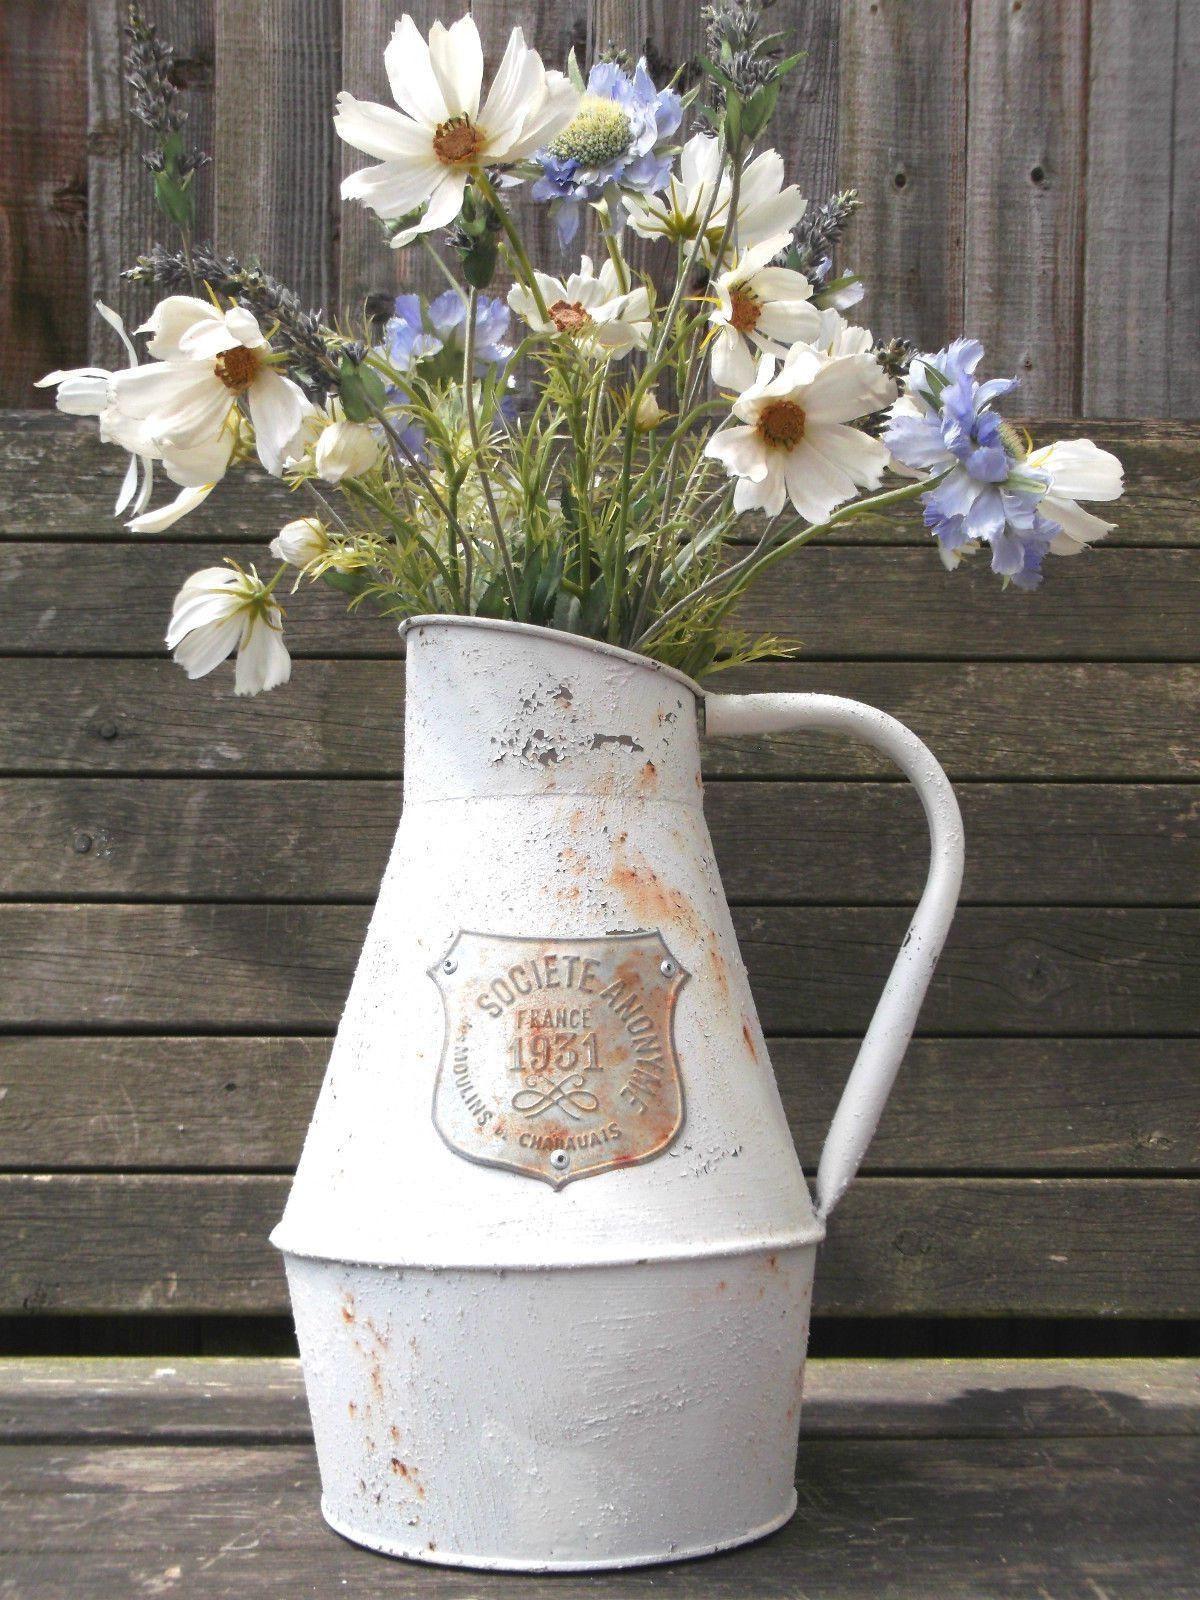 flower vase antique of 30 copper flower vase the weekly world for french flower bucket h vases galvanized french vase tin bucketi 0d